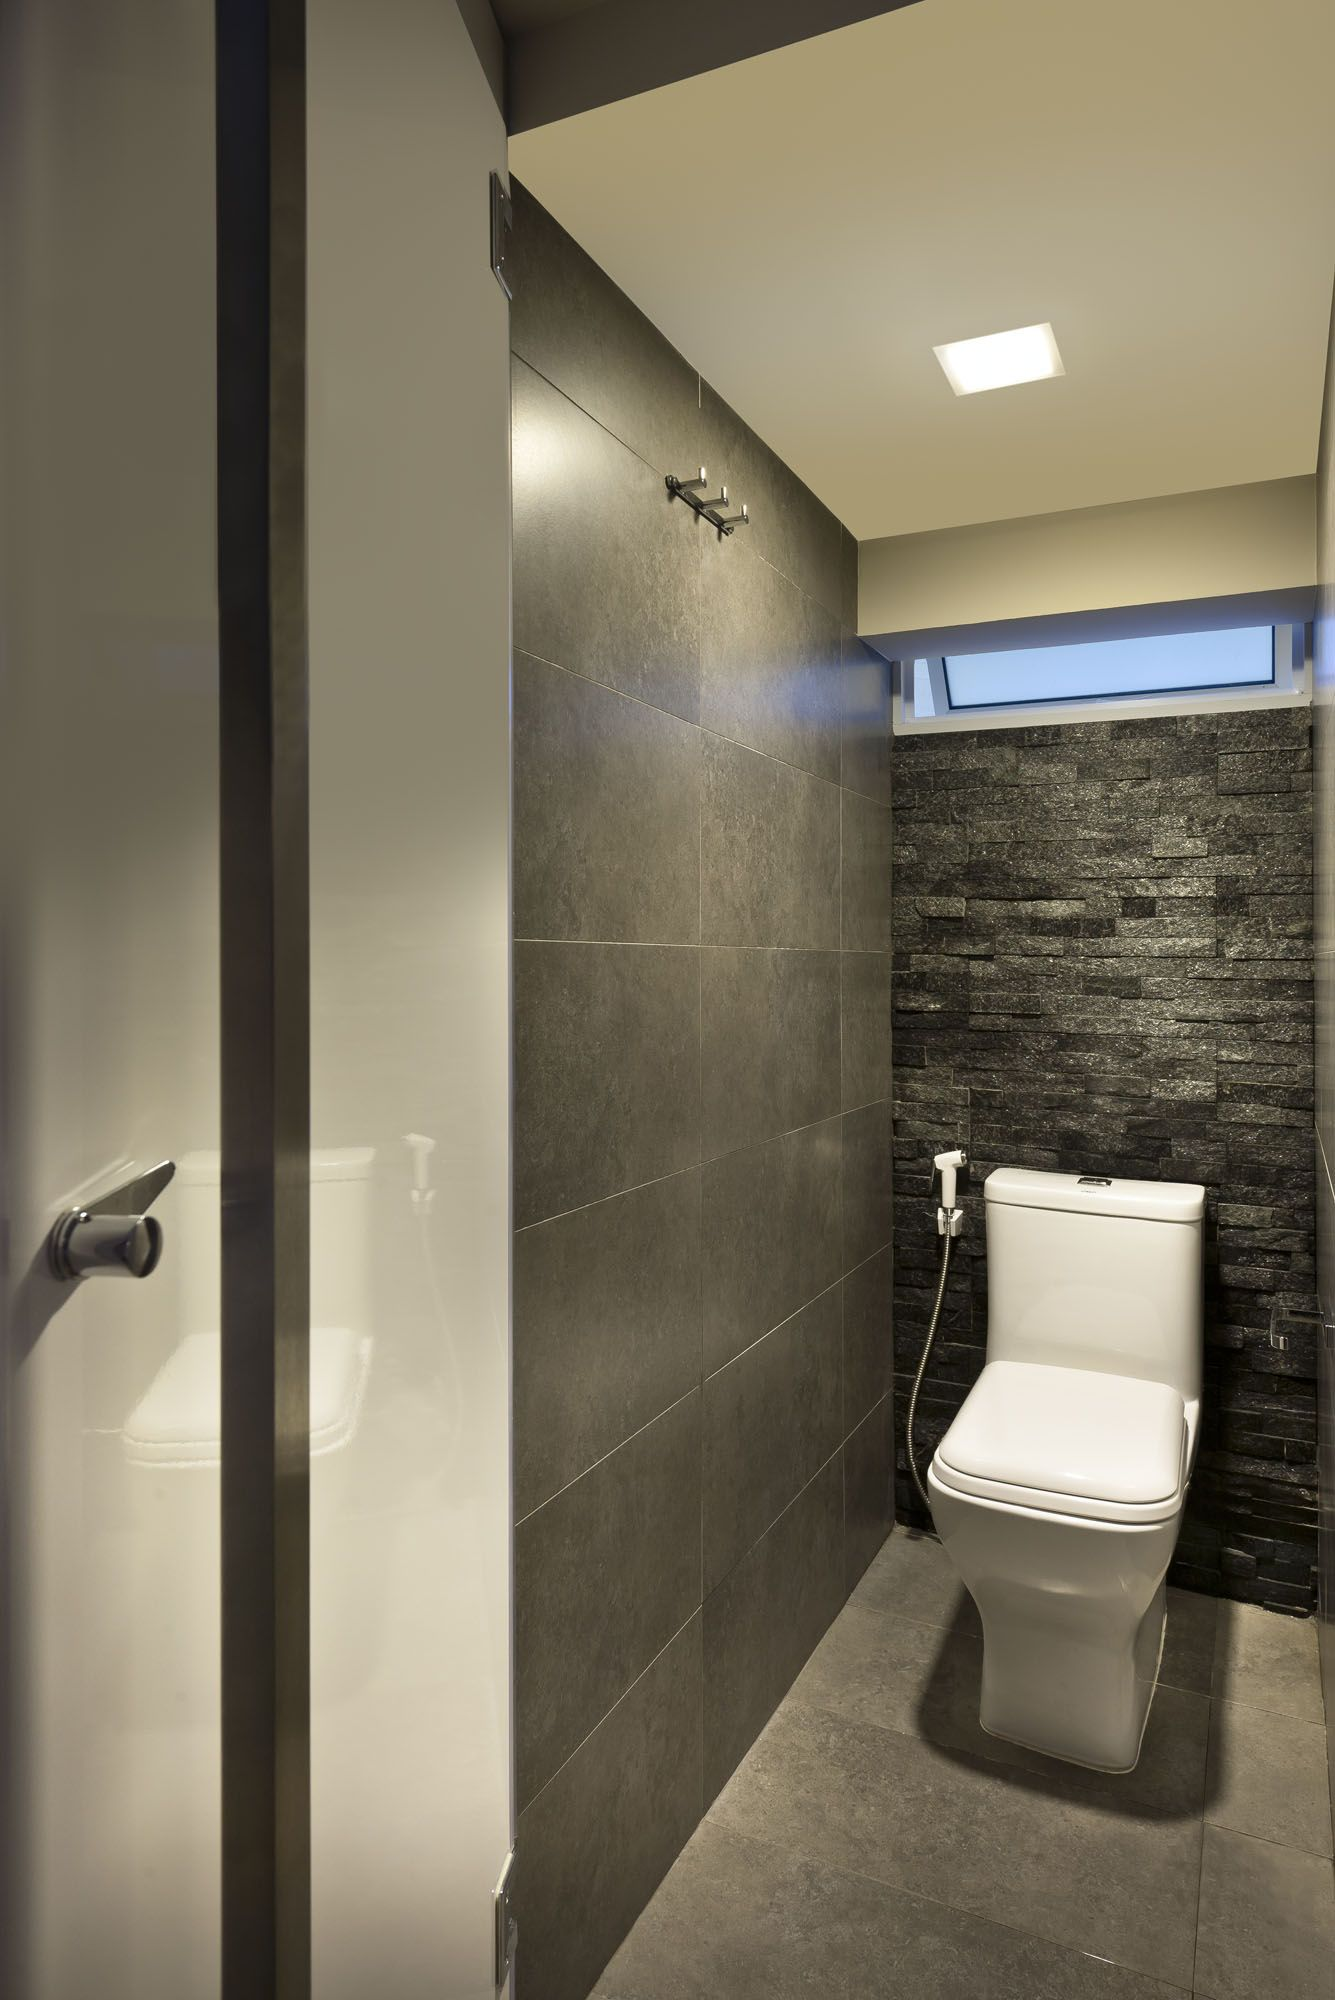 HDB | Bathroom Interior design by Rezt 'n Relax of Singapore